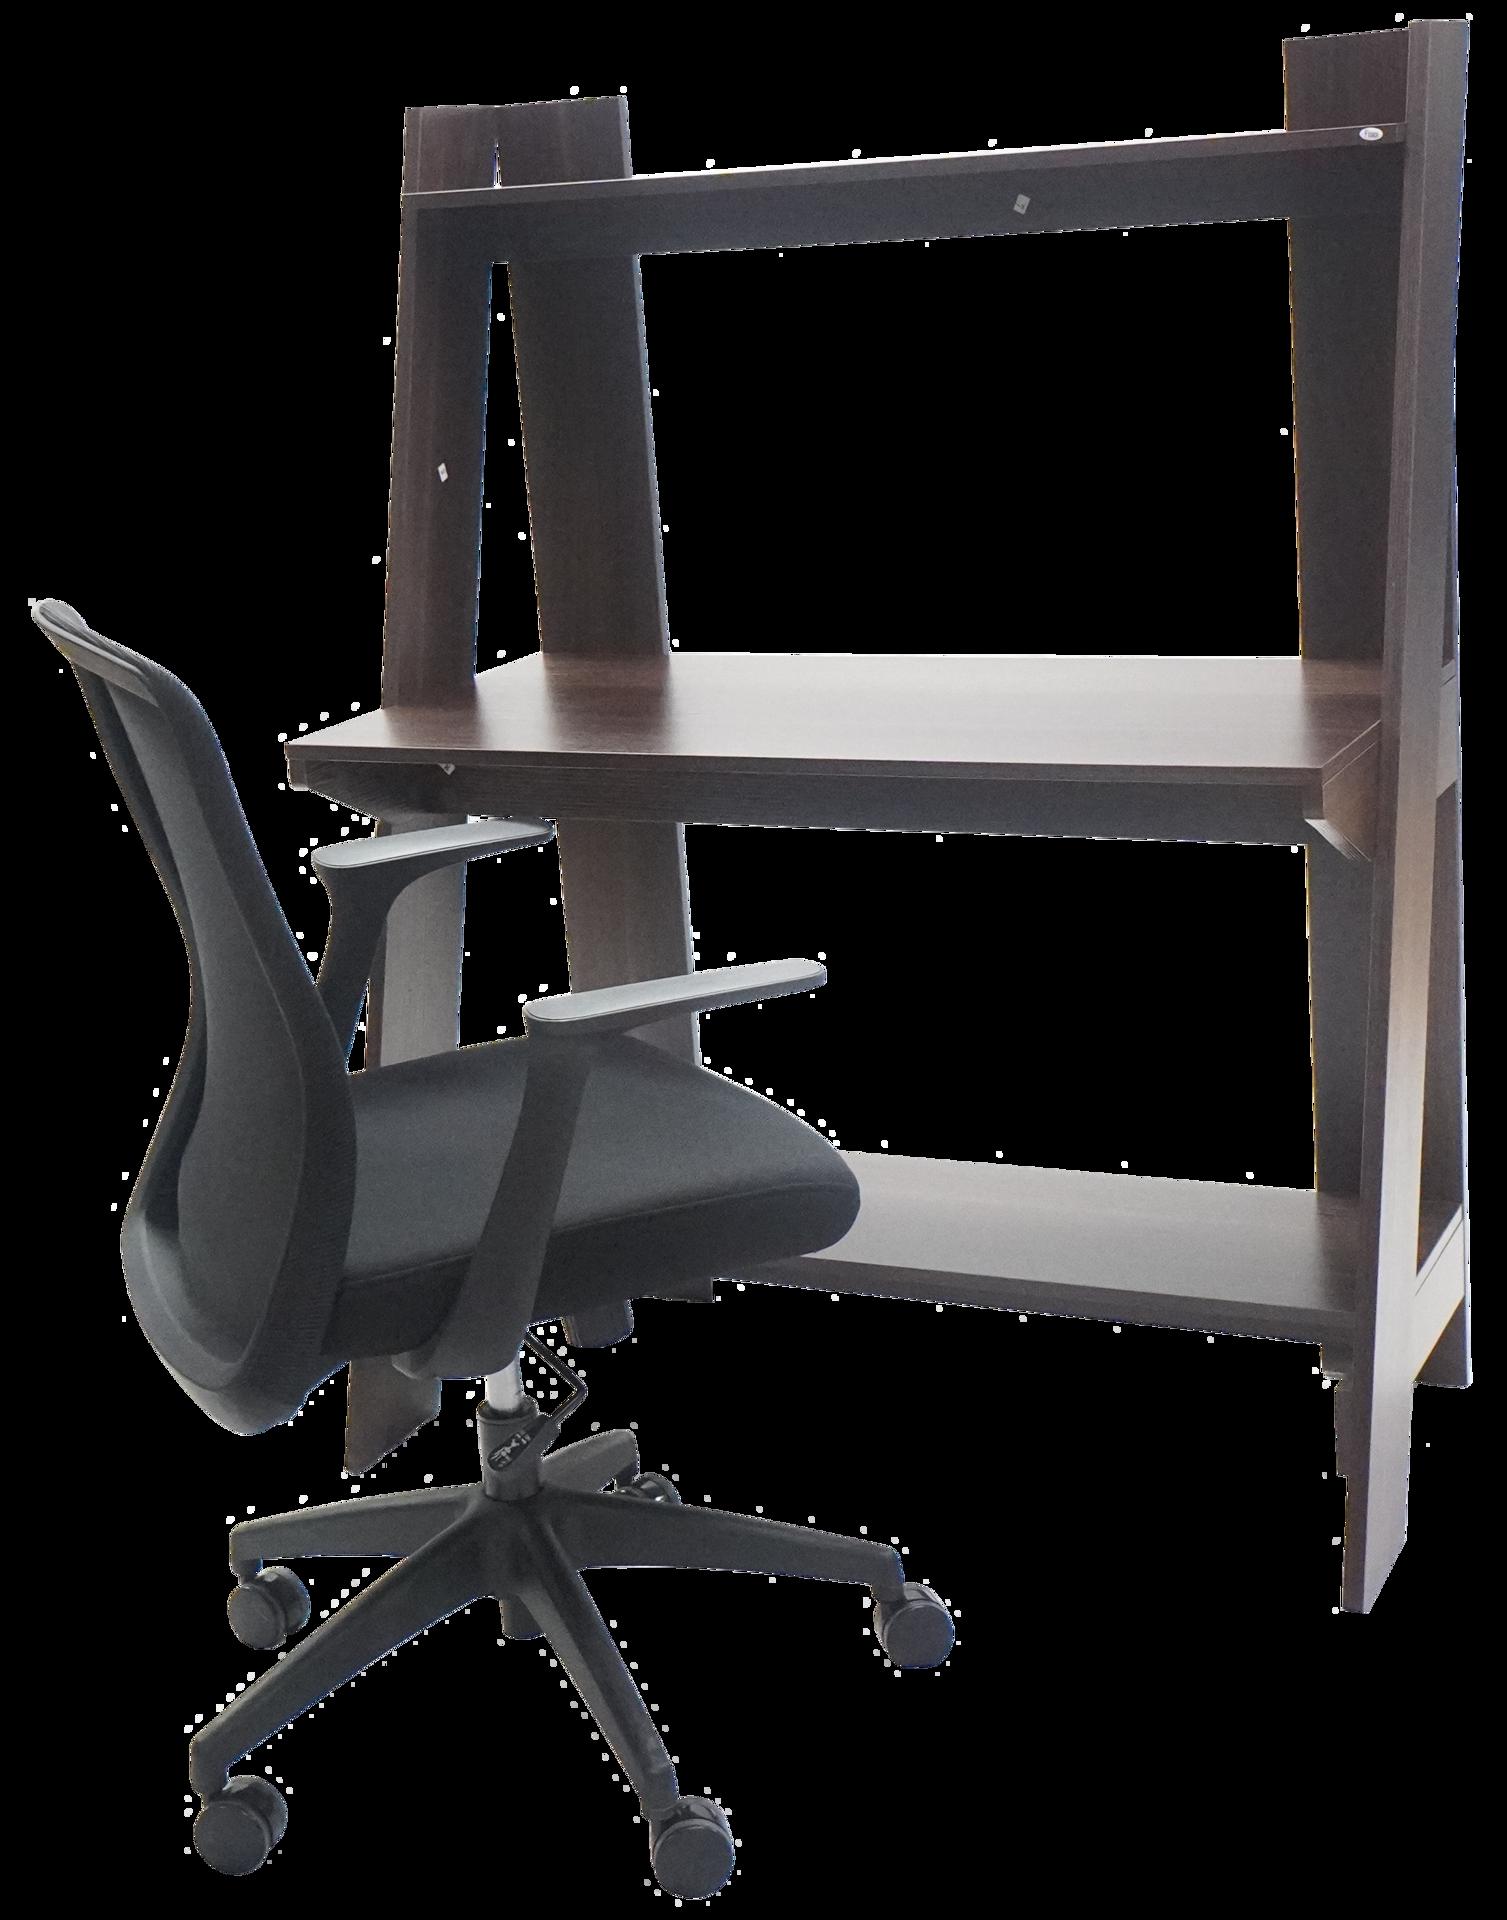 Picture of ST-B2015 Torch 1000 x 500 x 1325 Ladder Shelf Desk - Black Walnut